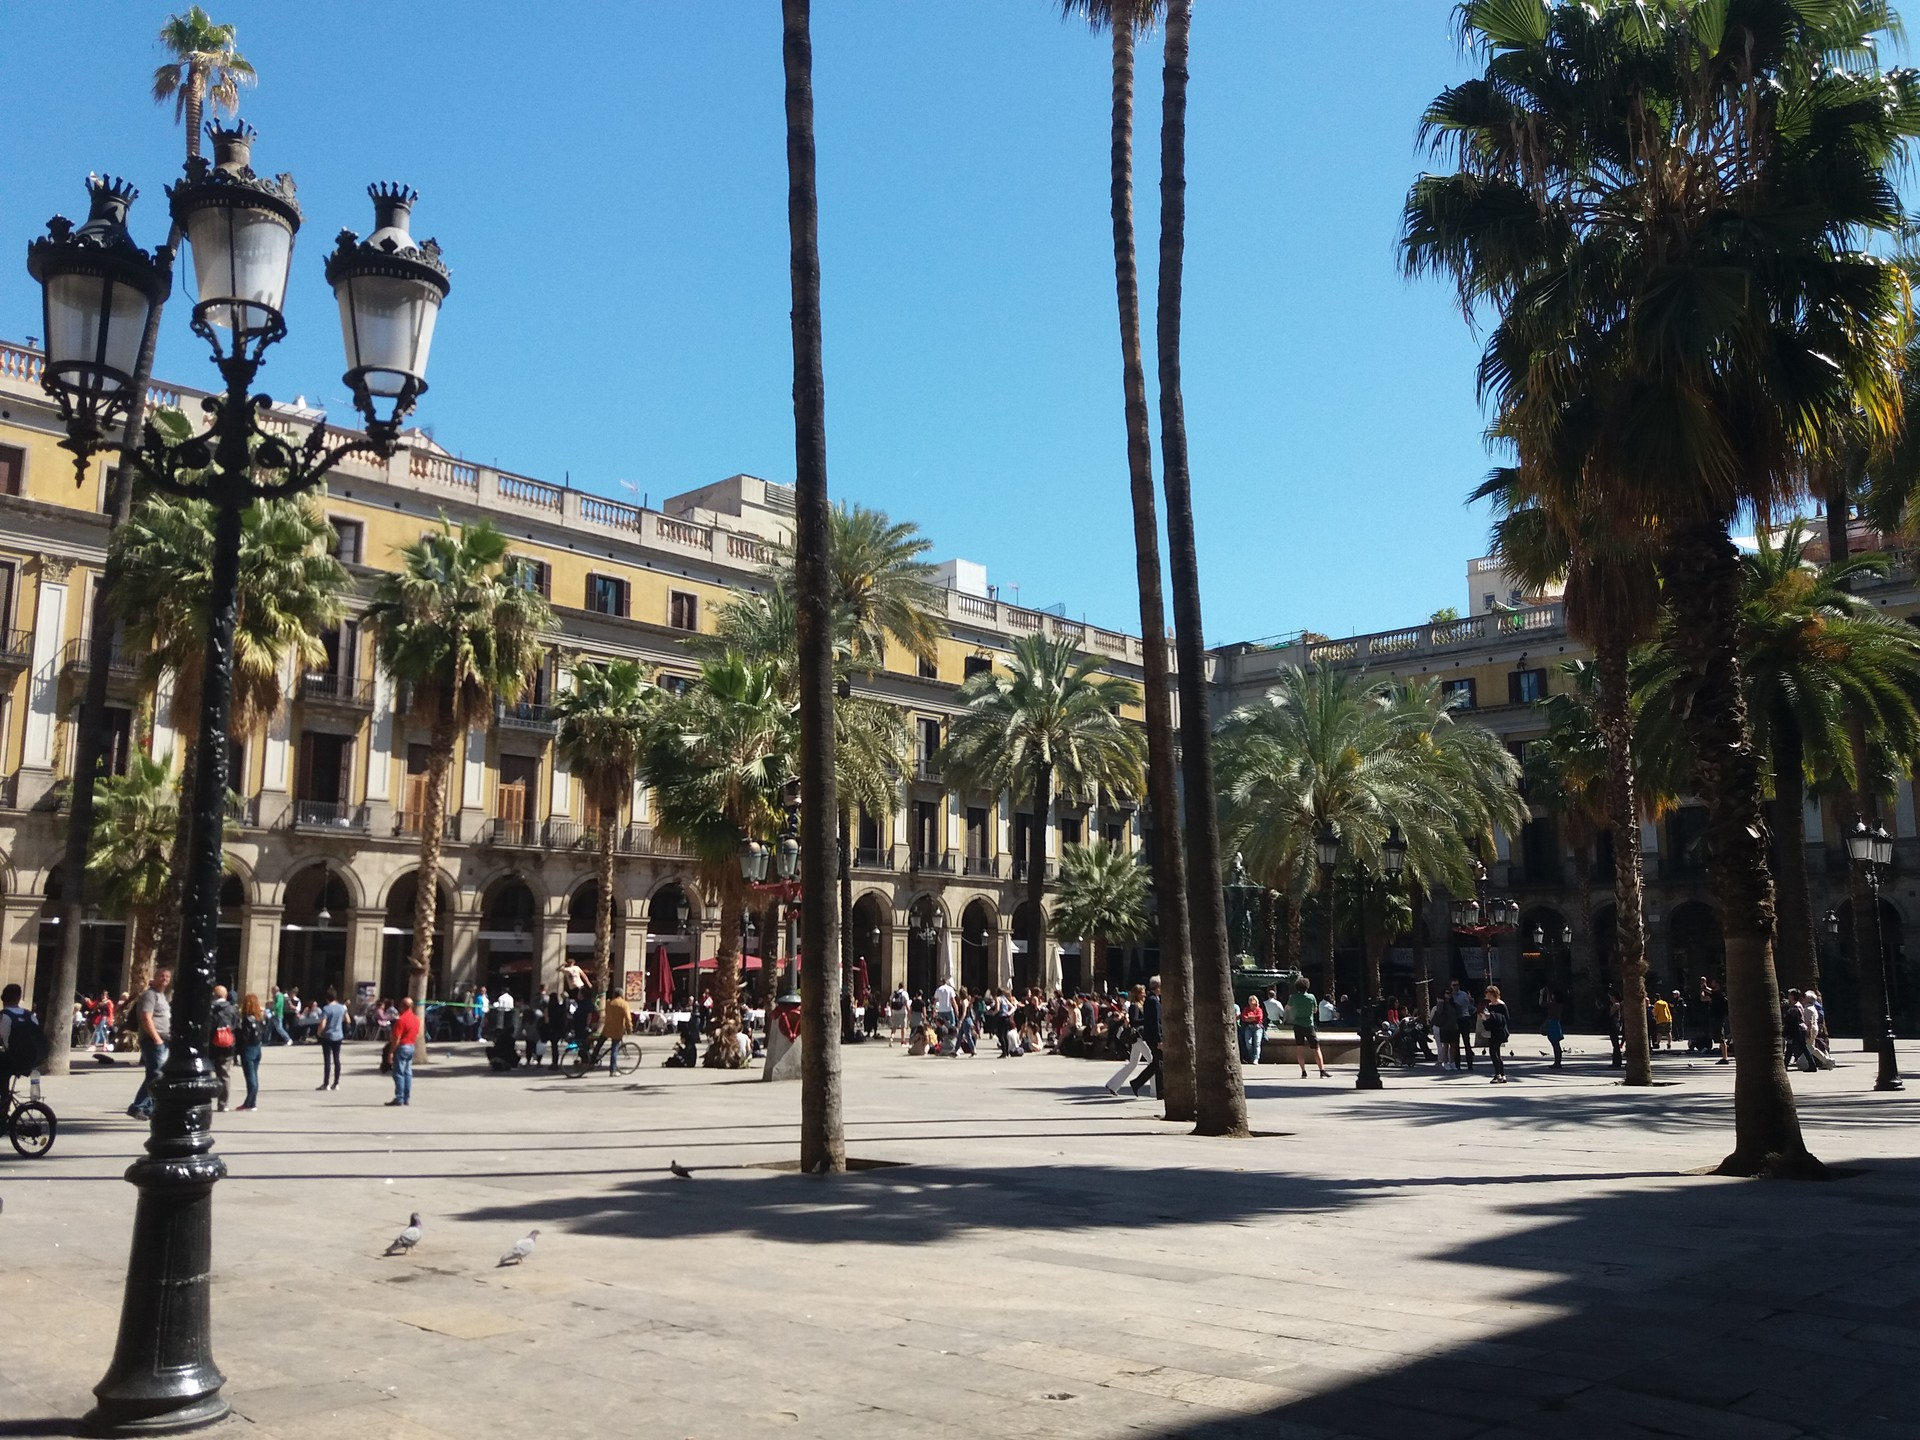 get-lost-barcelona-impressions-51cf5b2f9